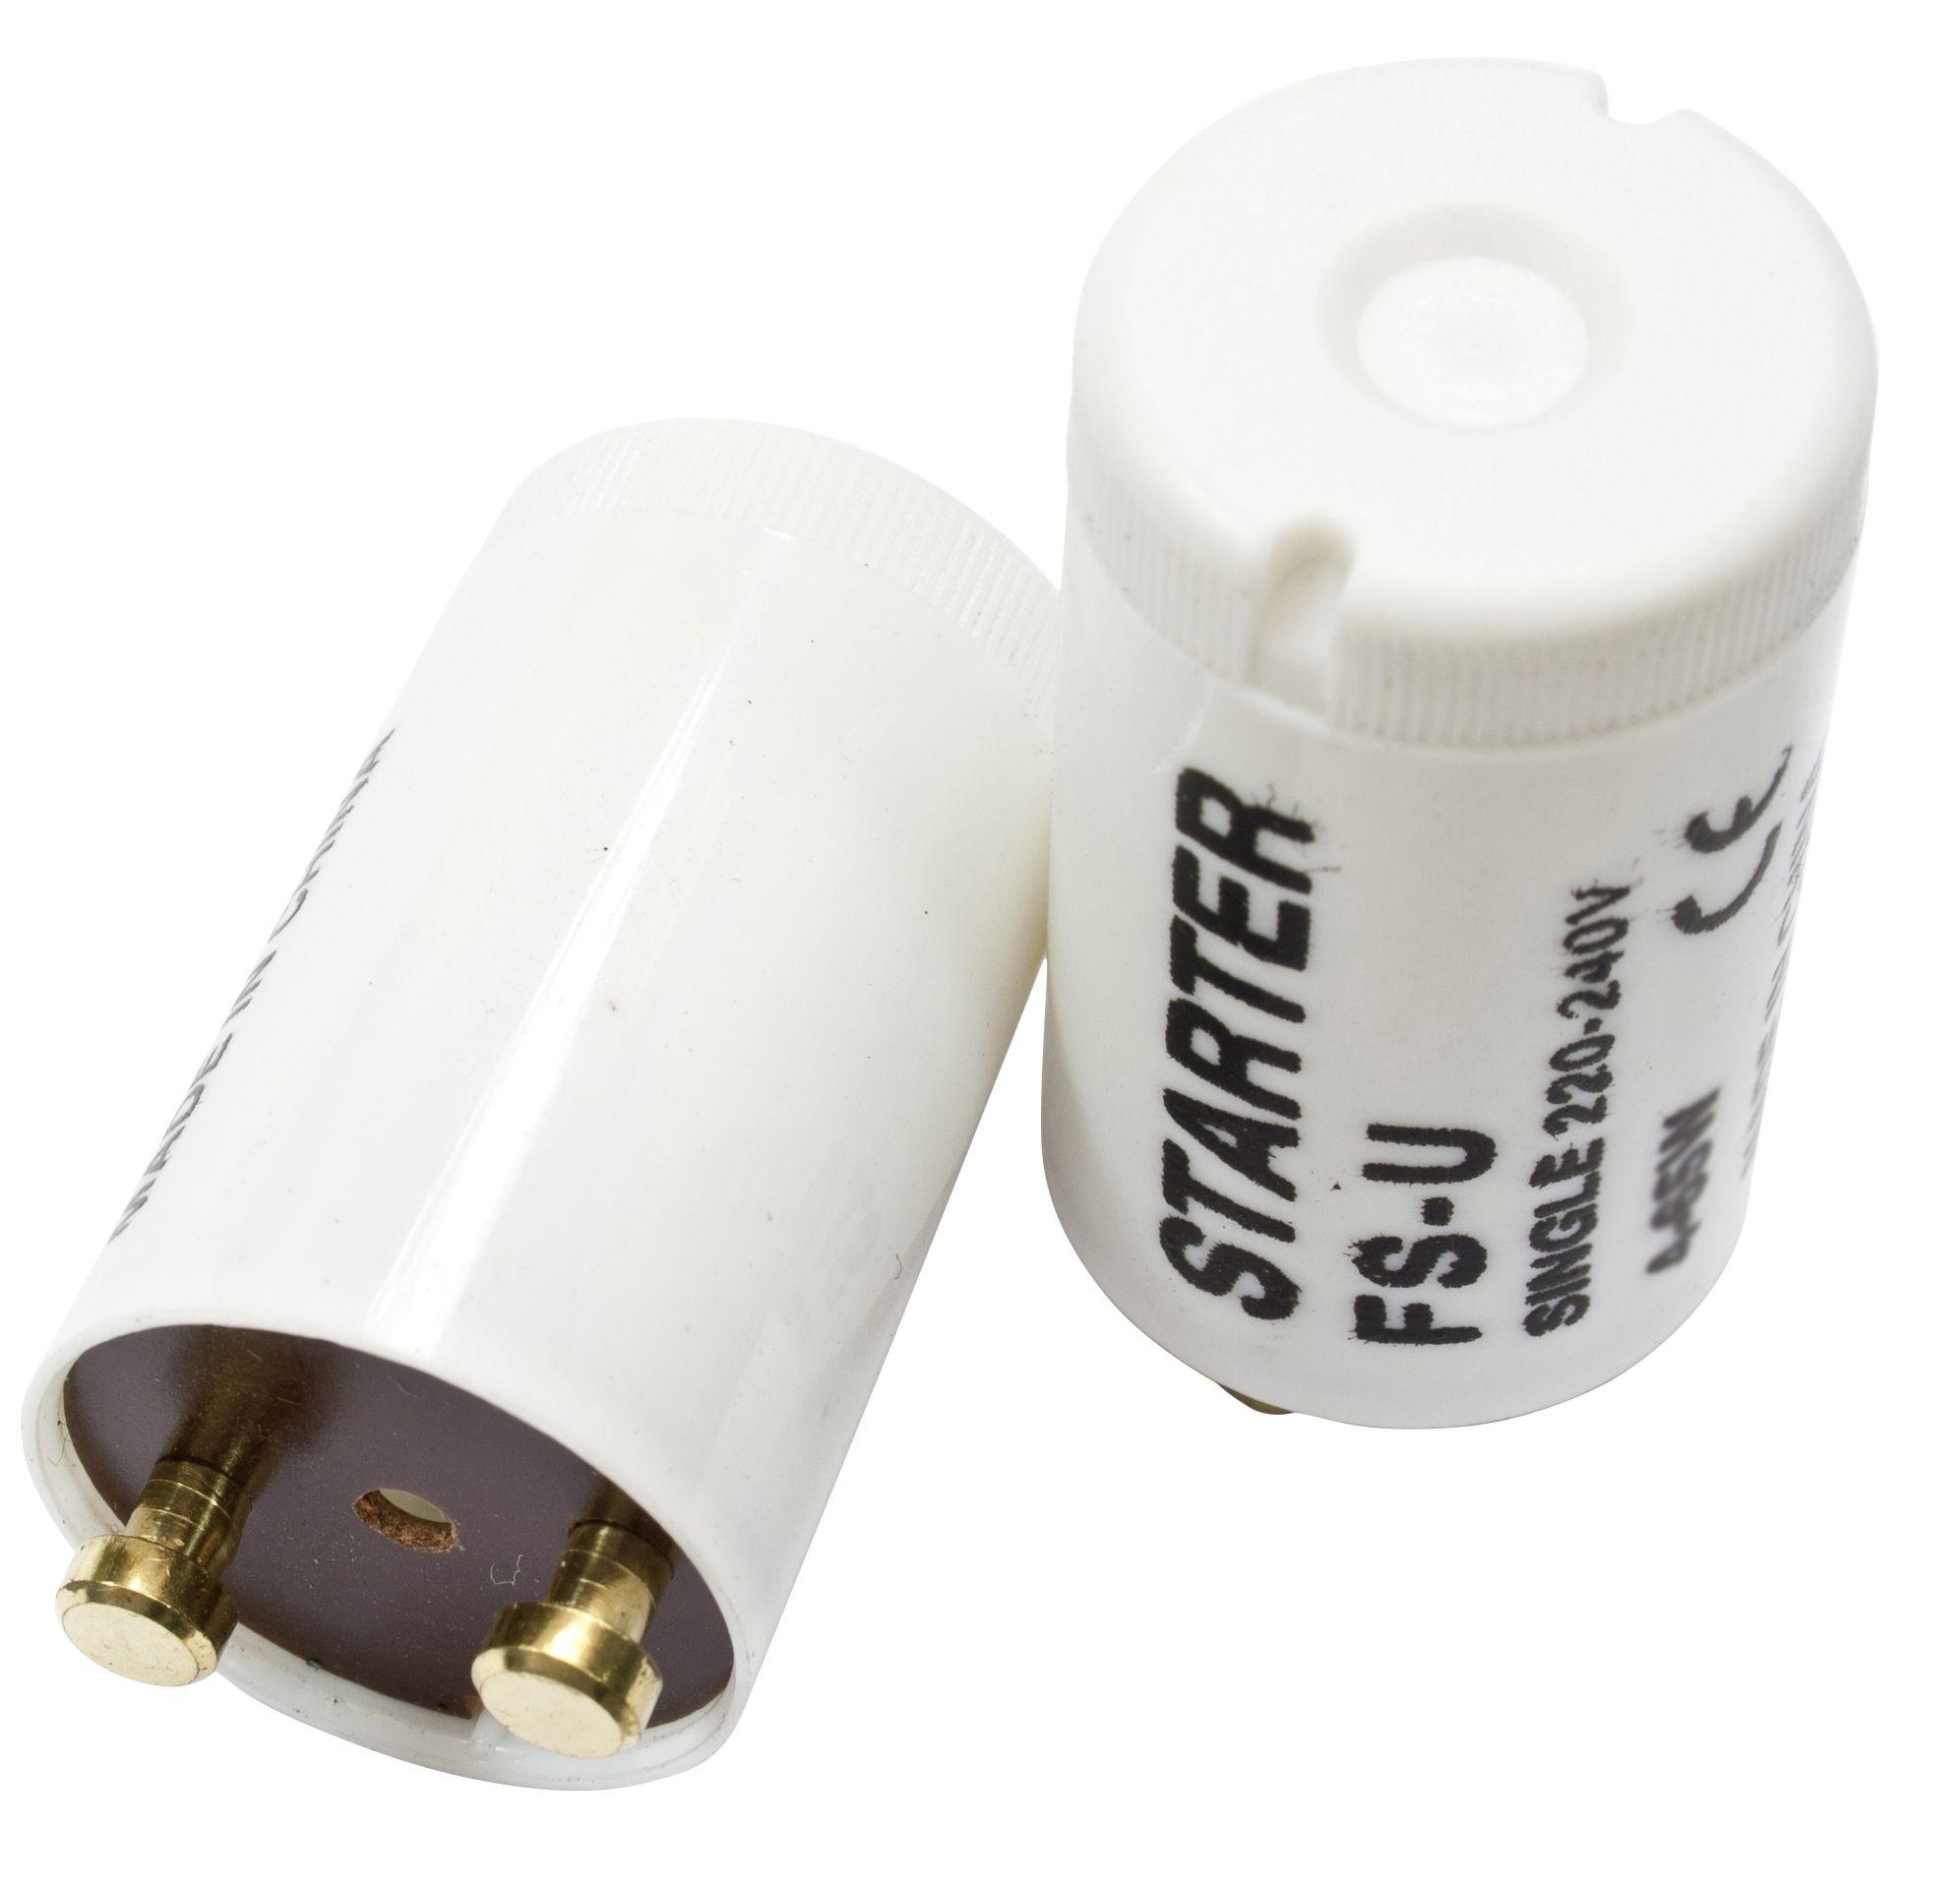 Bathroom Light Switches B&Q b&q fluorescent starter switch 240v 4-65w | departments | diy at b&q